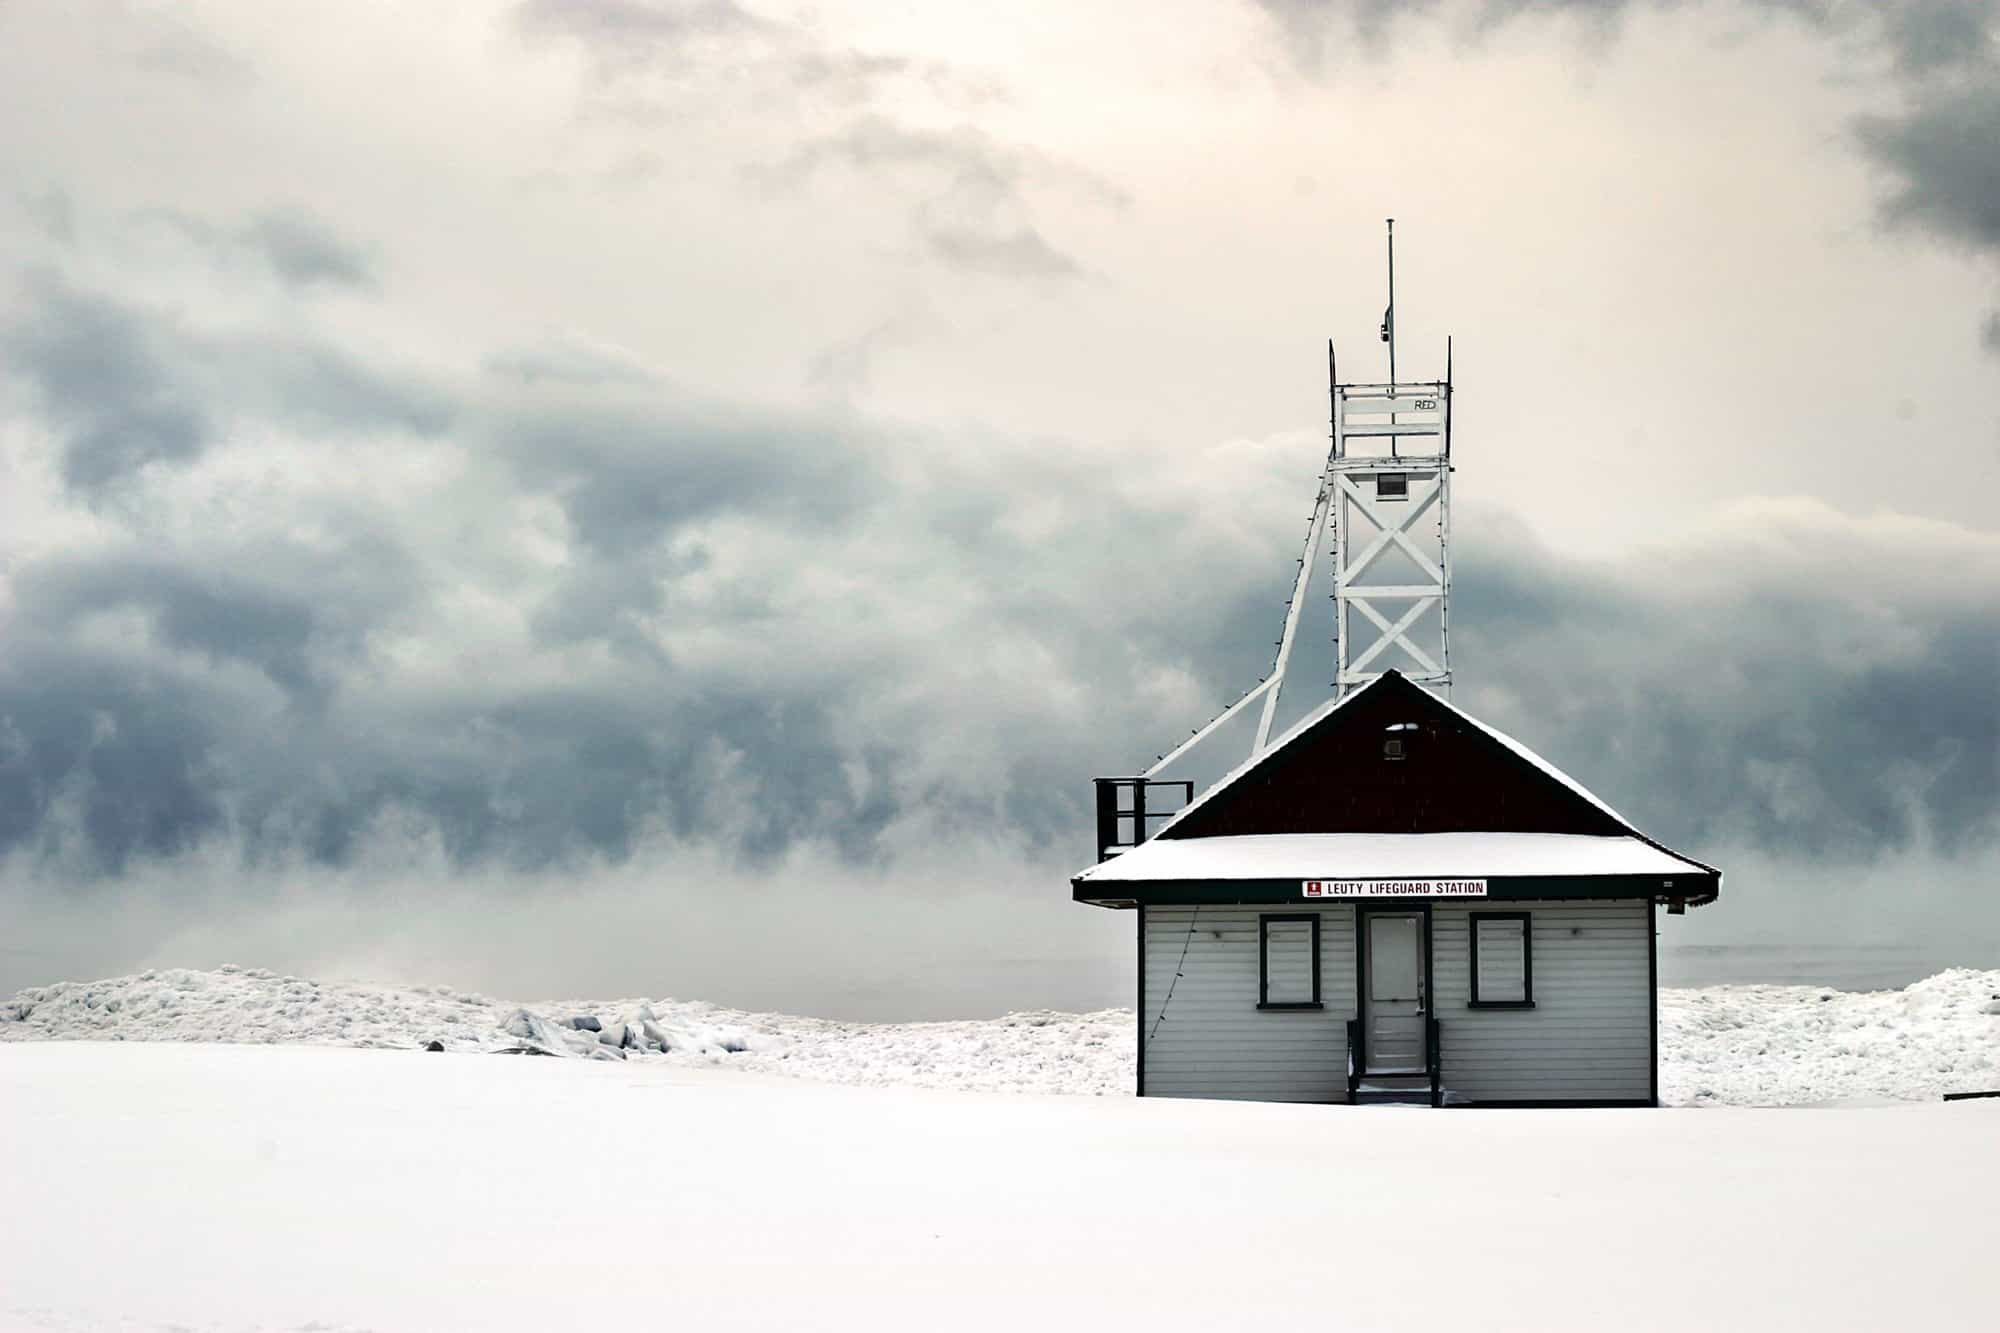 snow-covered-lifeguard-station_4460x4460-min-min.jpg